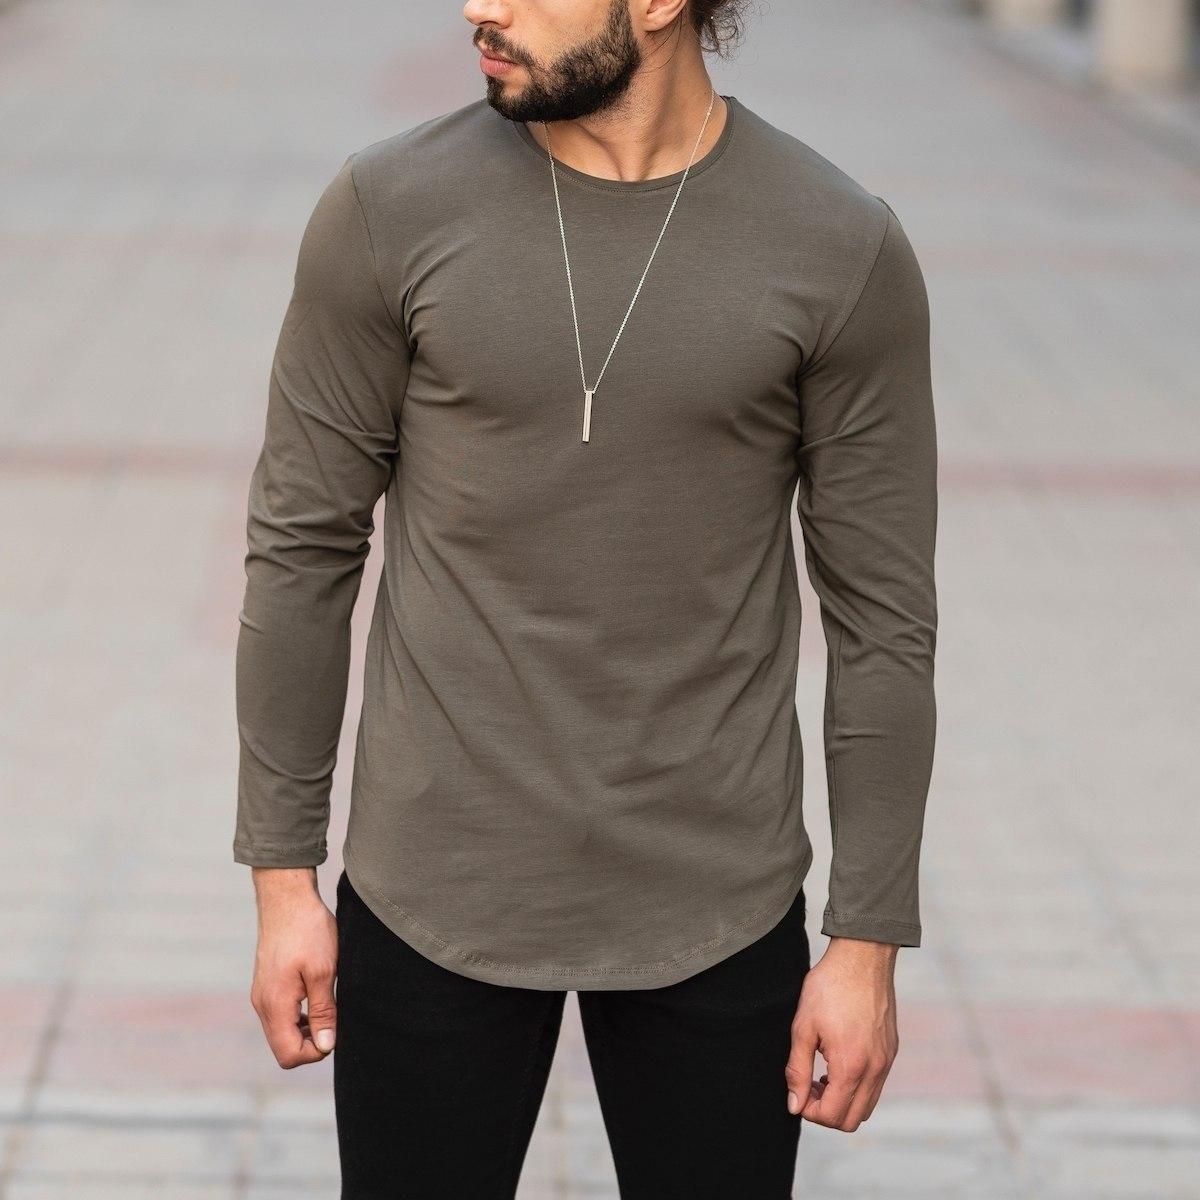 Basic Sweatshirt In Khaki